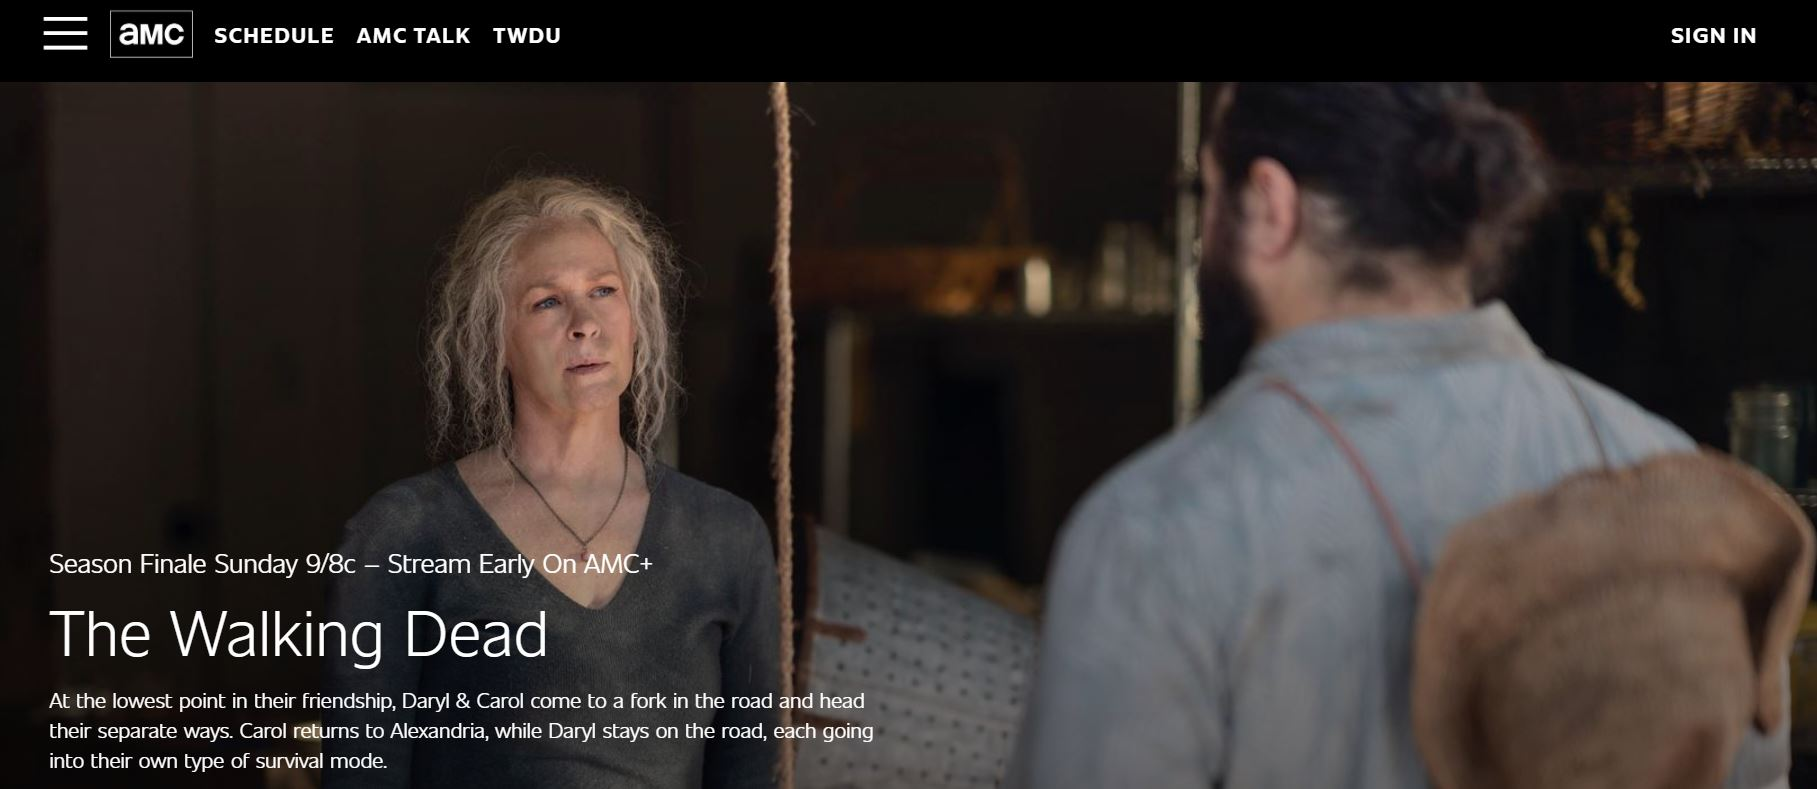 AMC website